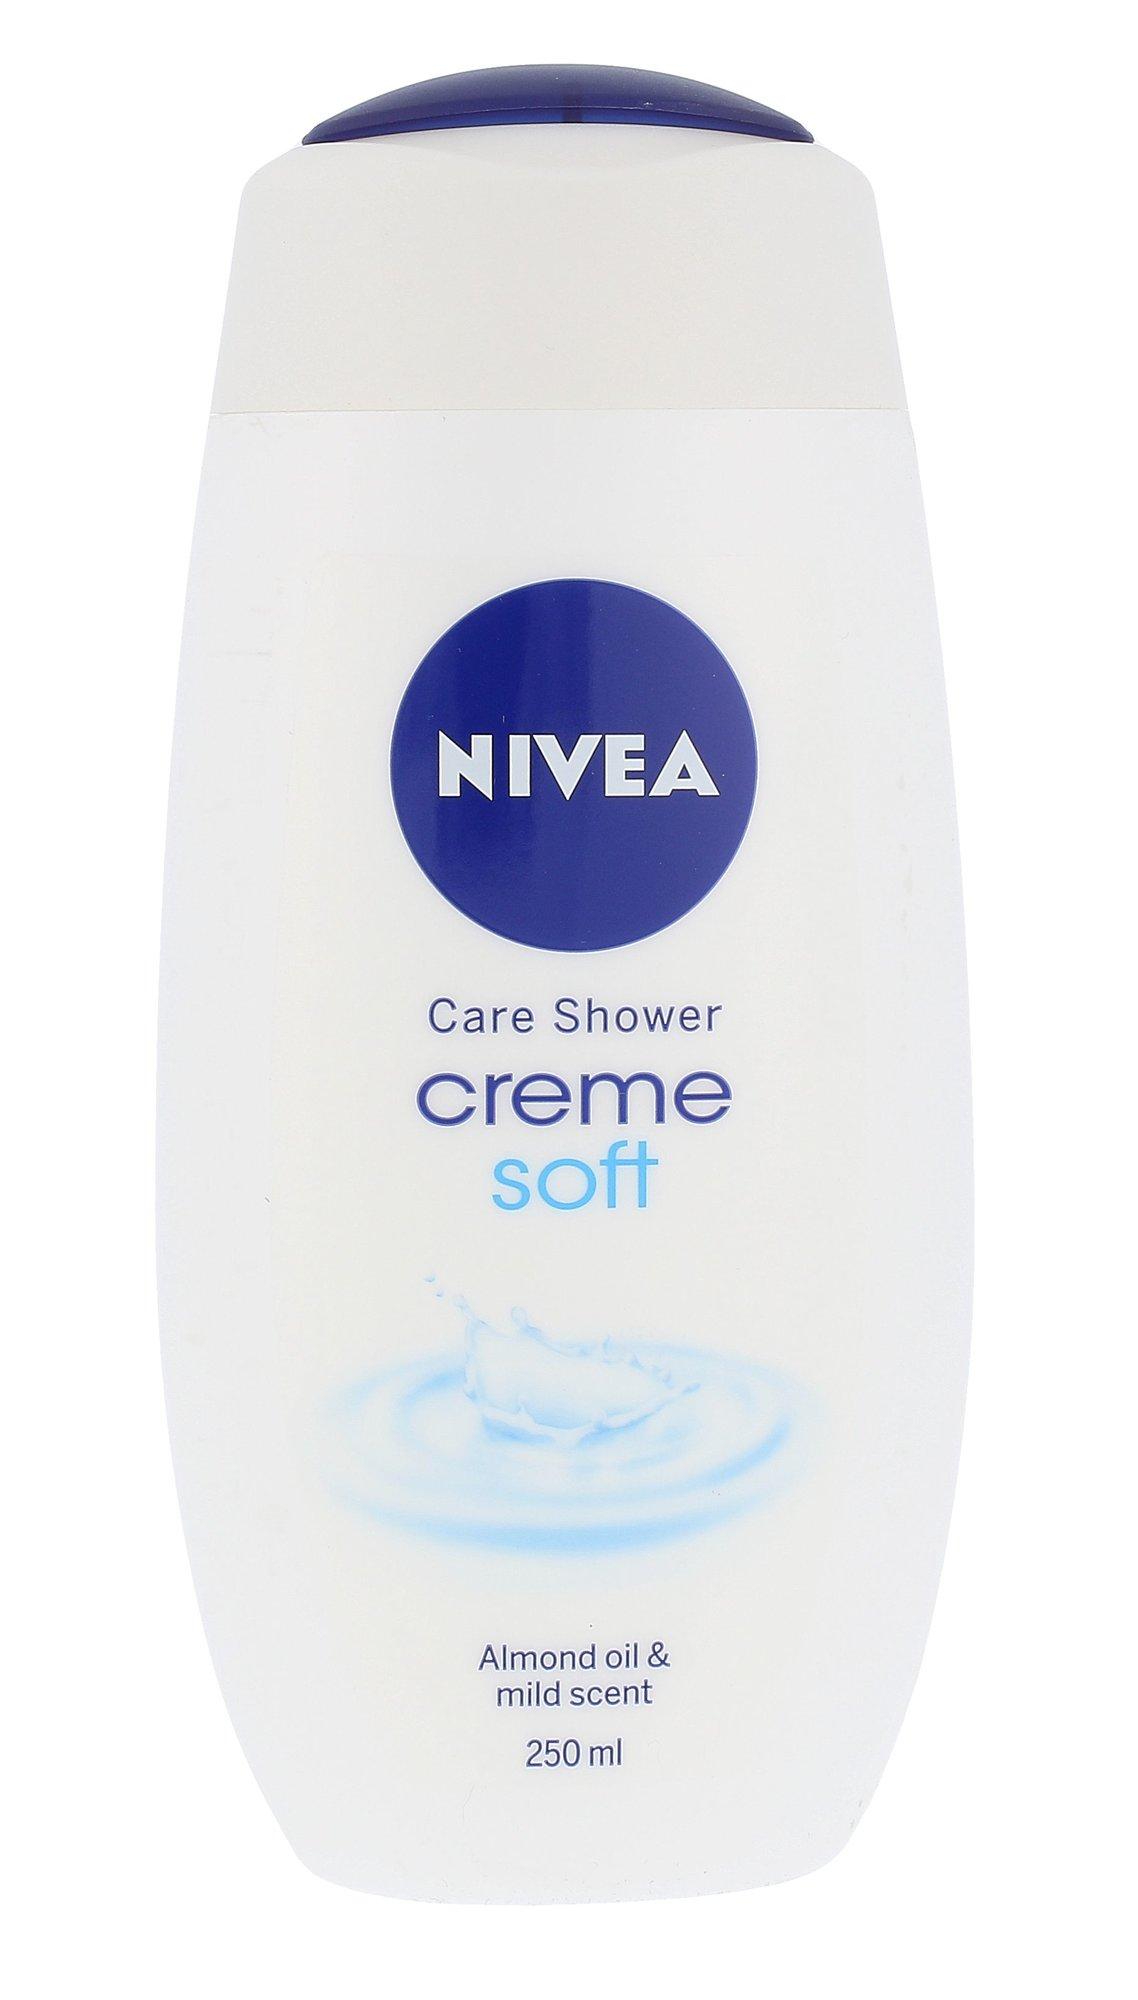 Nivea Creme Soft Cream Shower Cosmetic 250ml